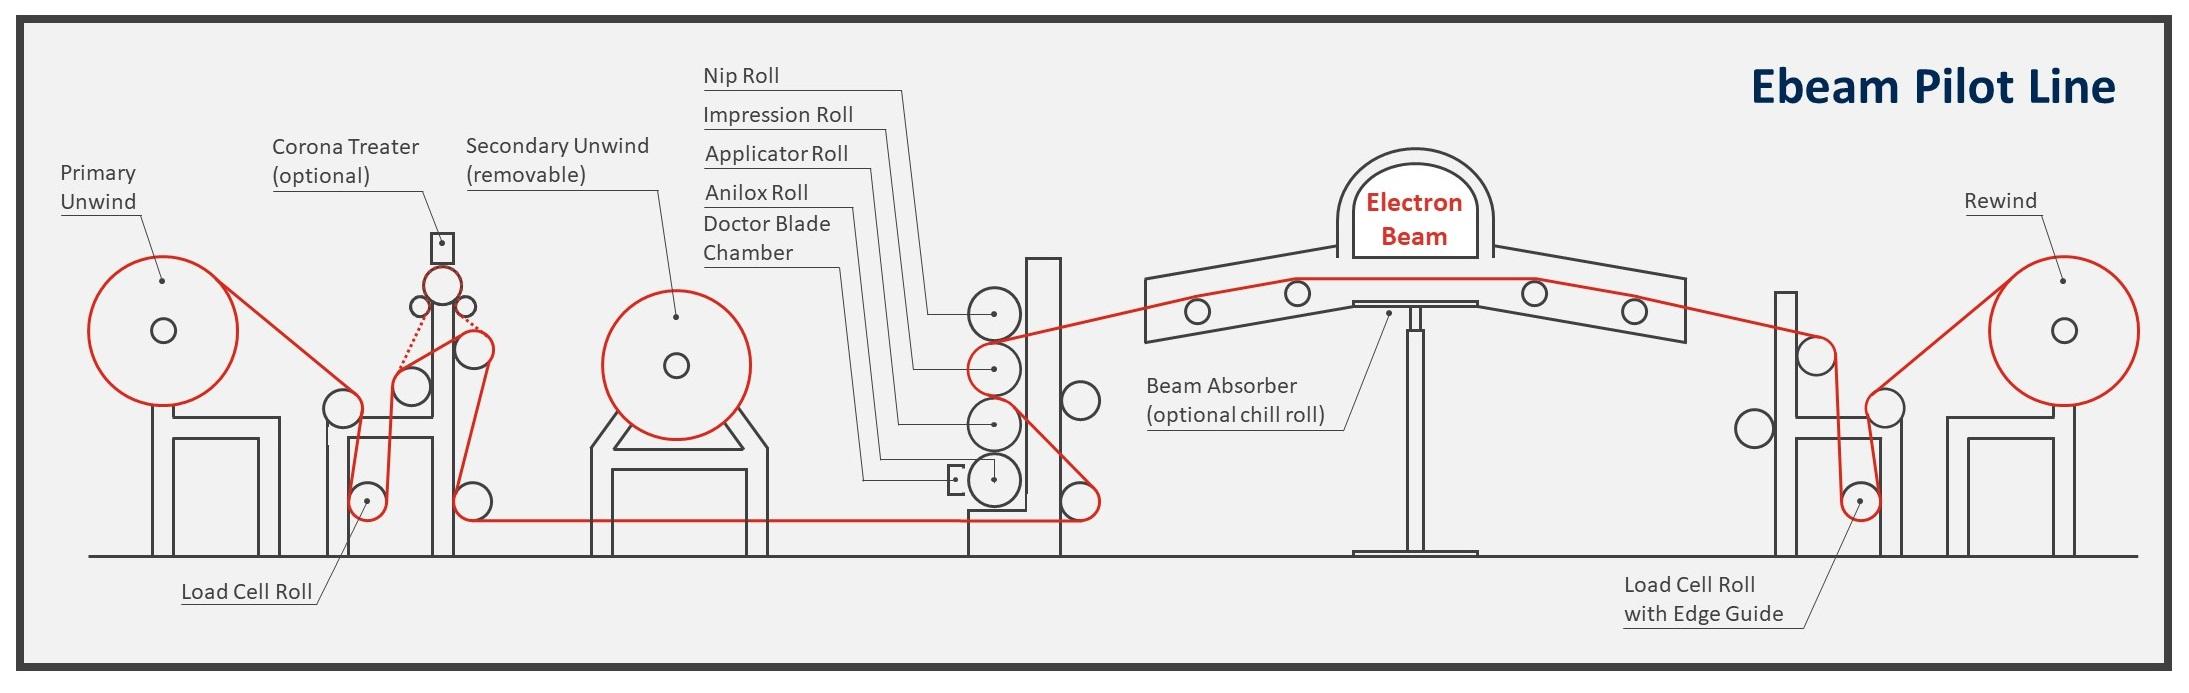 Pilot Line Schematic